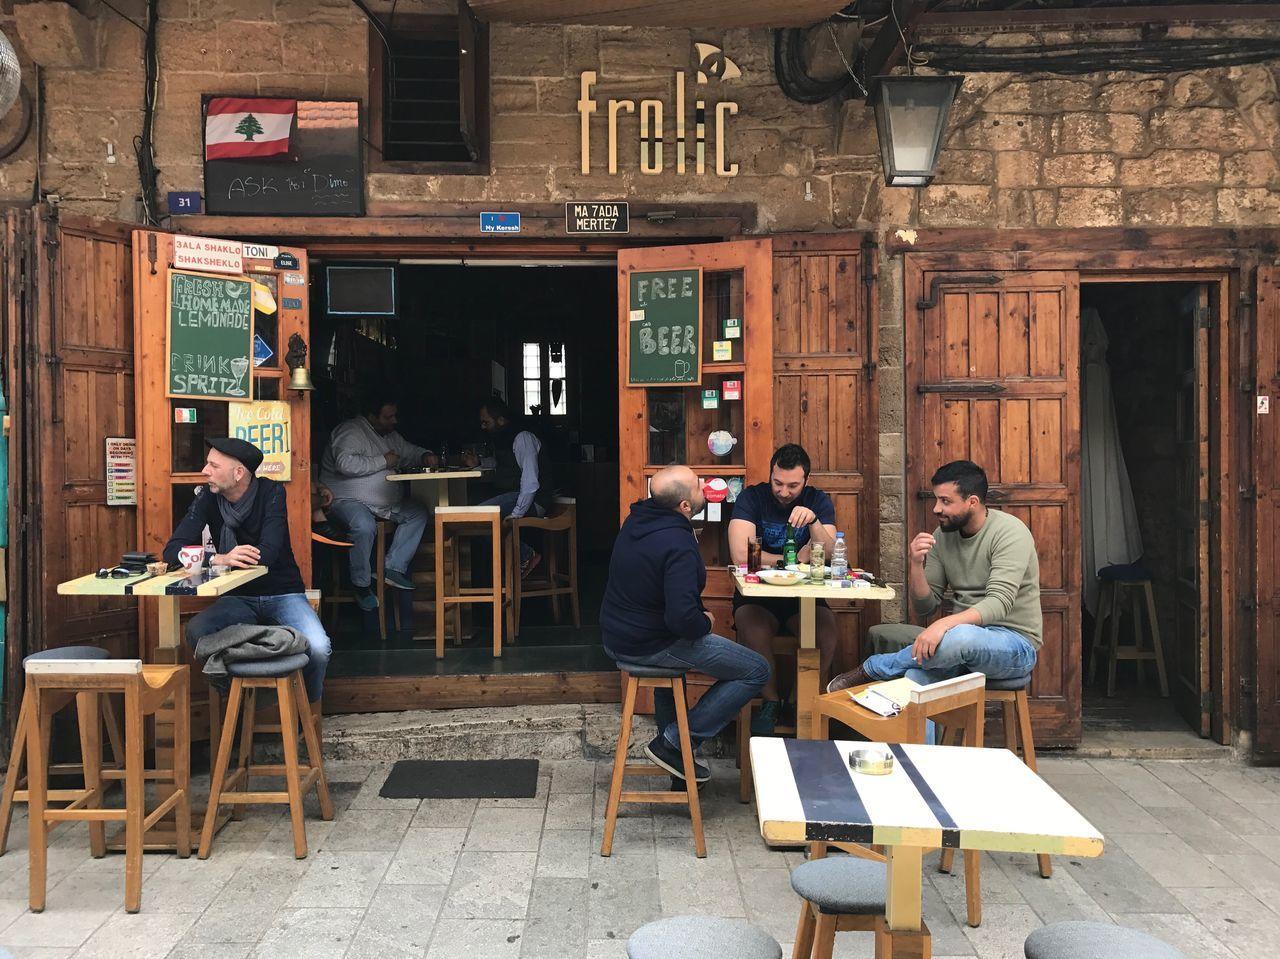 Byblos vibes! Streetphotography Cafe Bar Hometown Lebanon